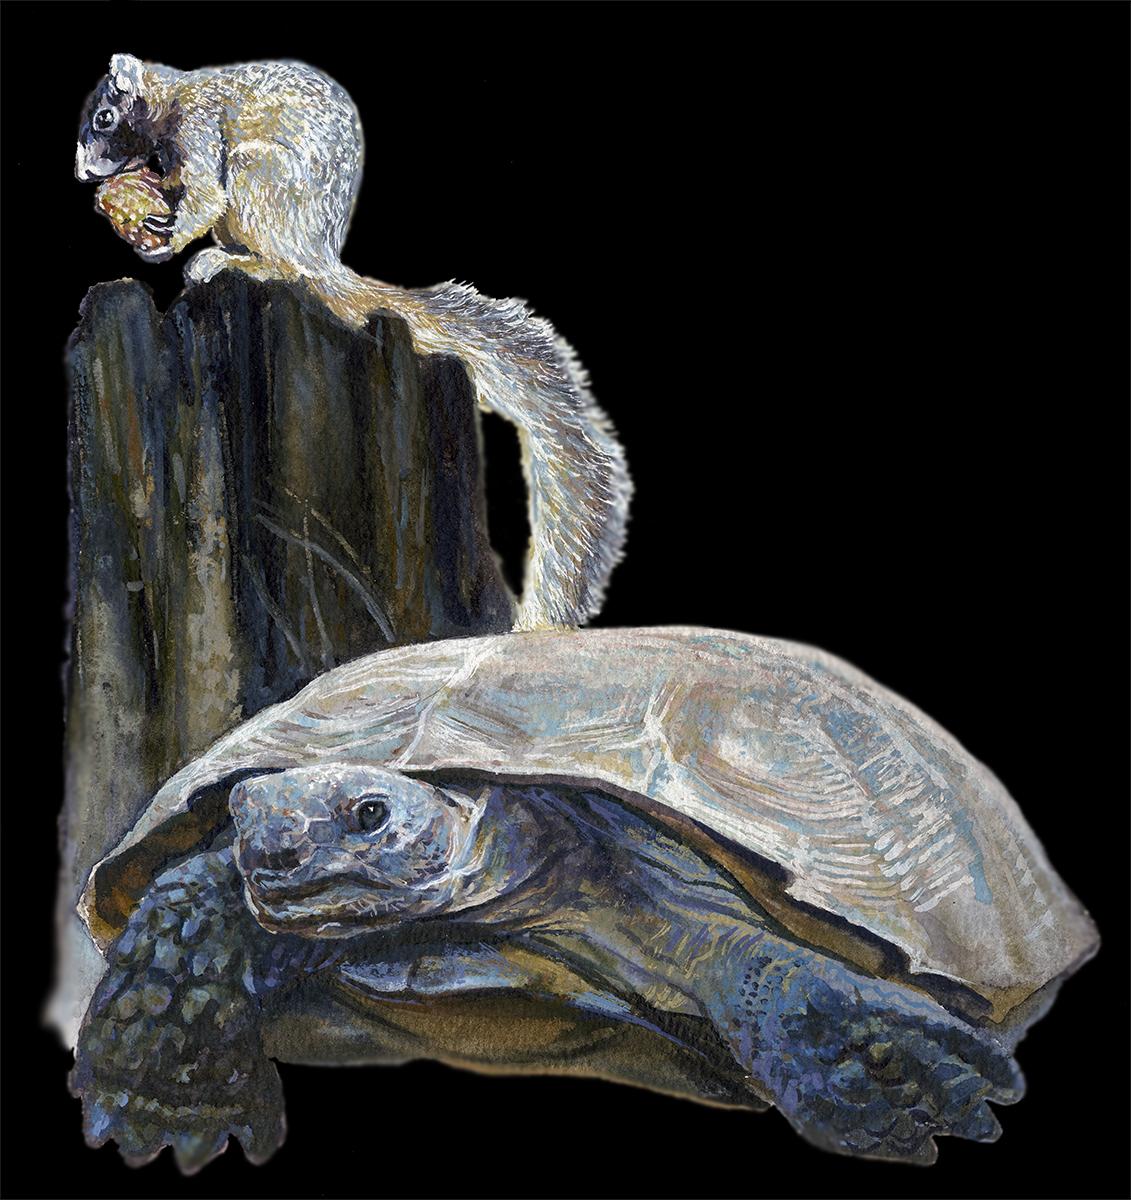 """Squirrel & Tortoise"" • Watercolor • DEP and Alafia River State Park, Hillsborough County, FL. © KT"